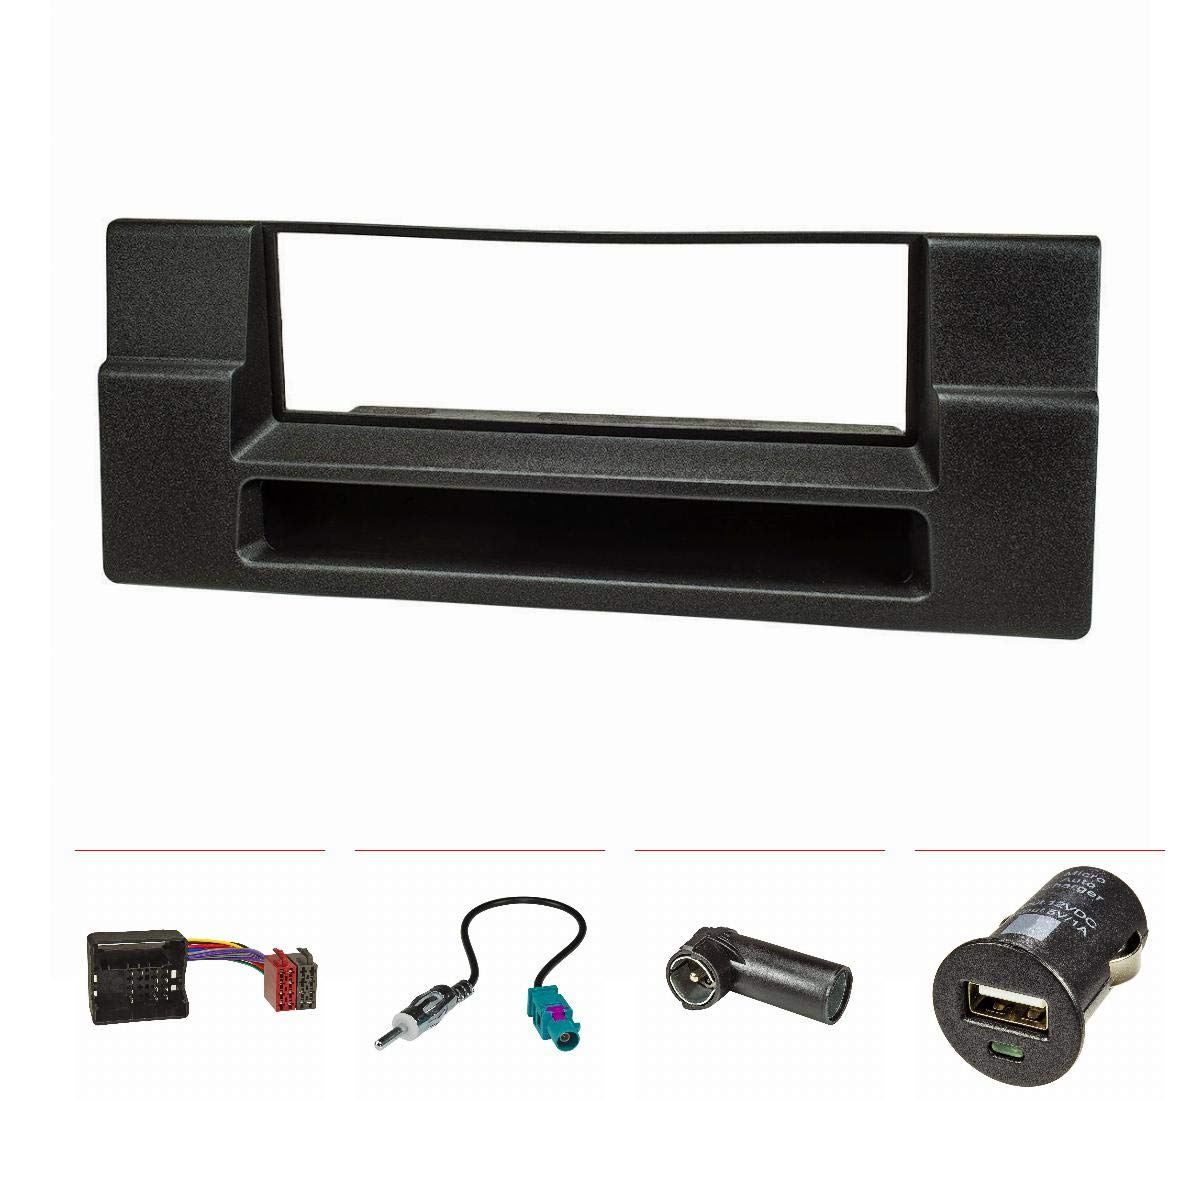 Fakra Antennenadapter DIN ISO tomzz Audio 2404-021 Radioblende Set f/ür BMW 5er E39 X5 E53 mit Ablagefach Quadlockadapter ISO